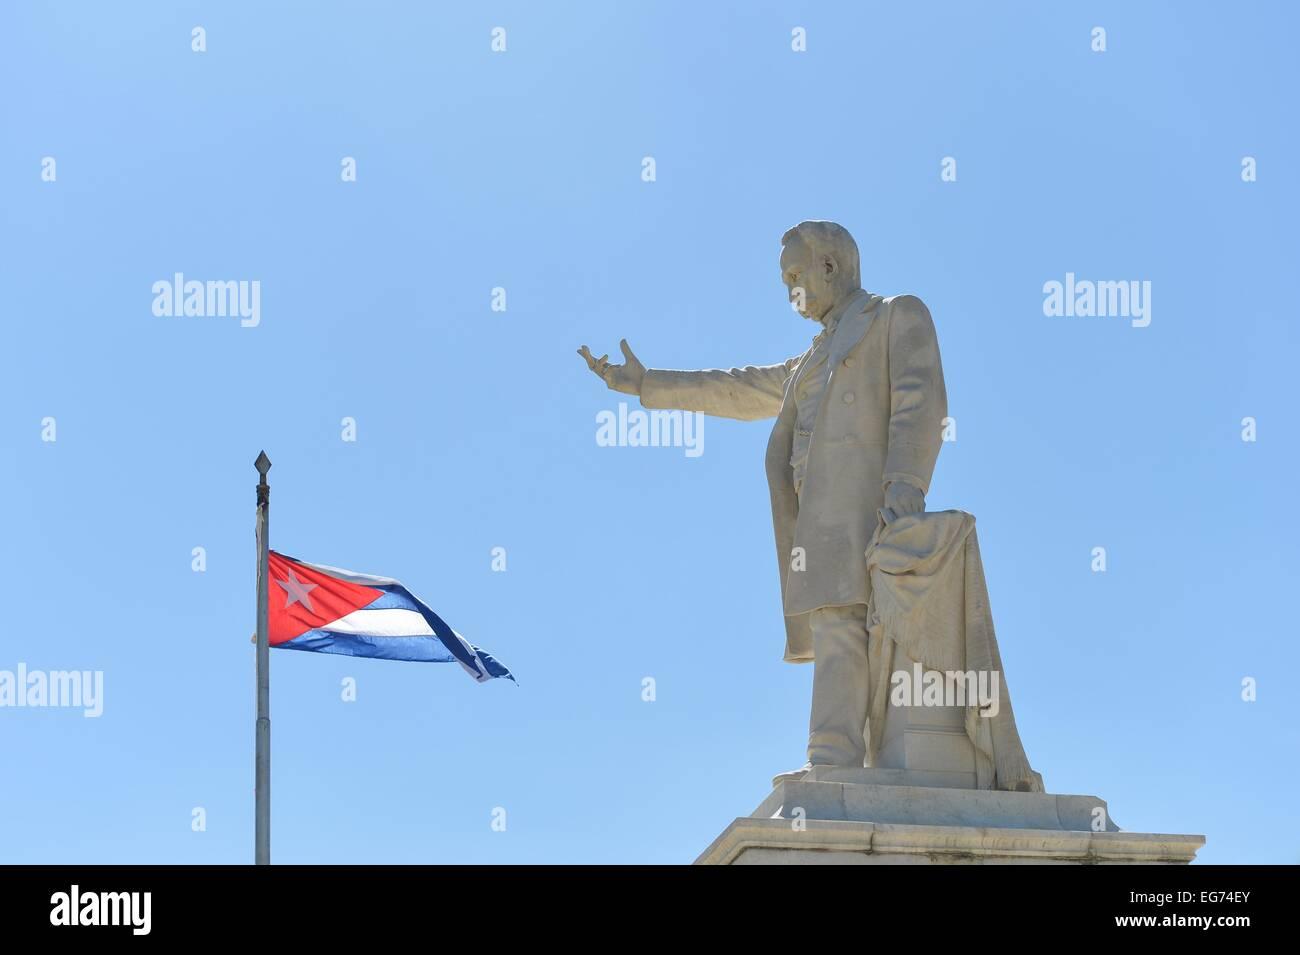 Jose Marti statue in the central square of Cienfuegos Cuba - Stock Image